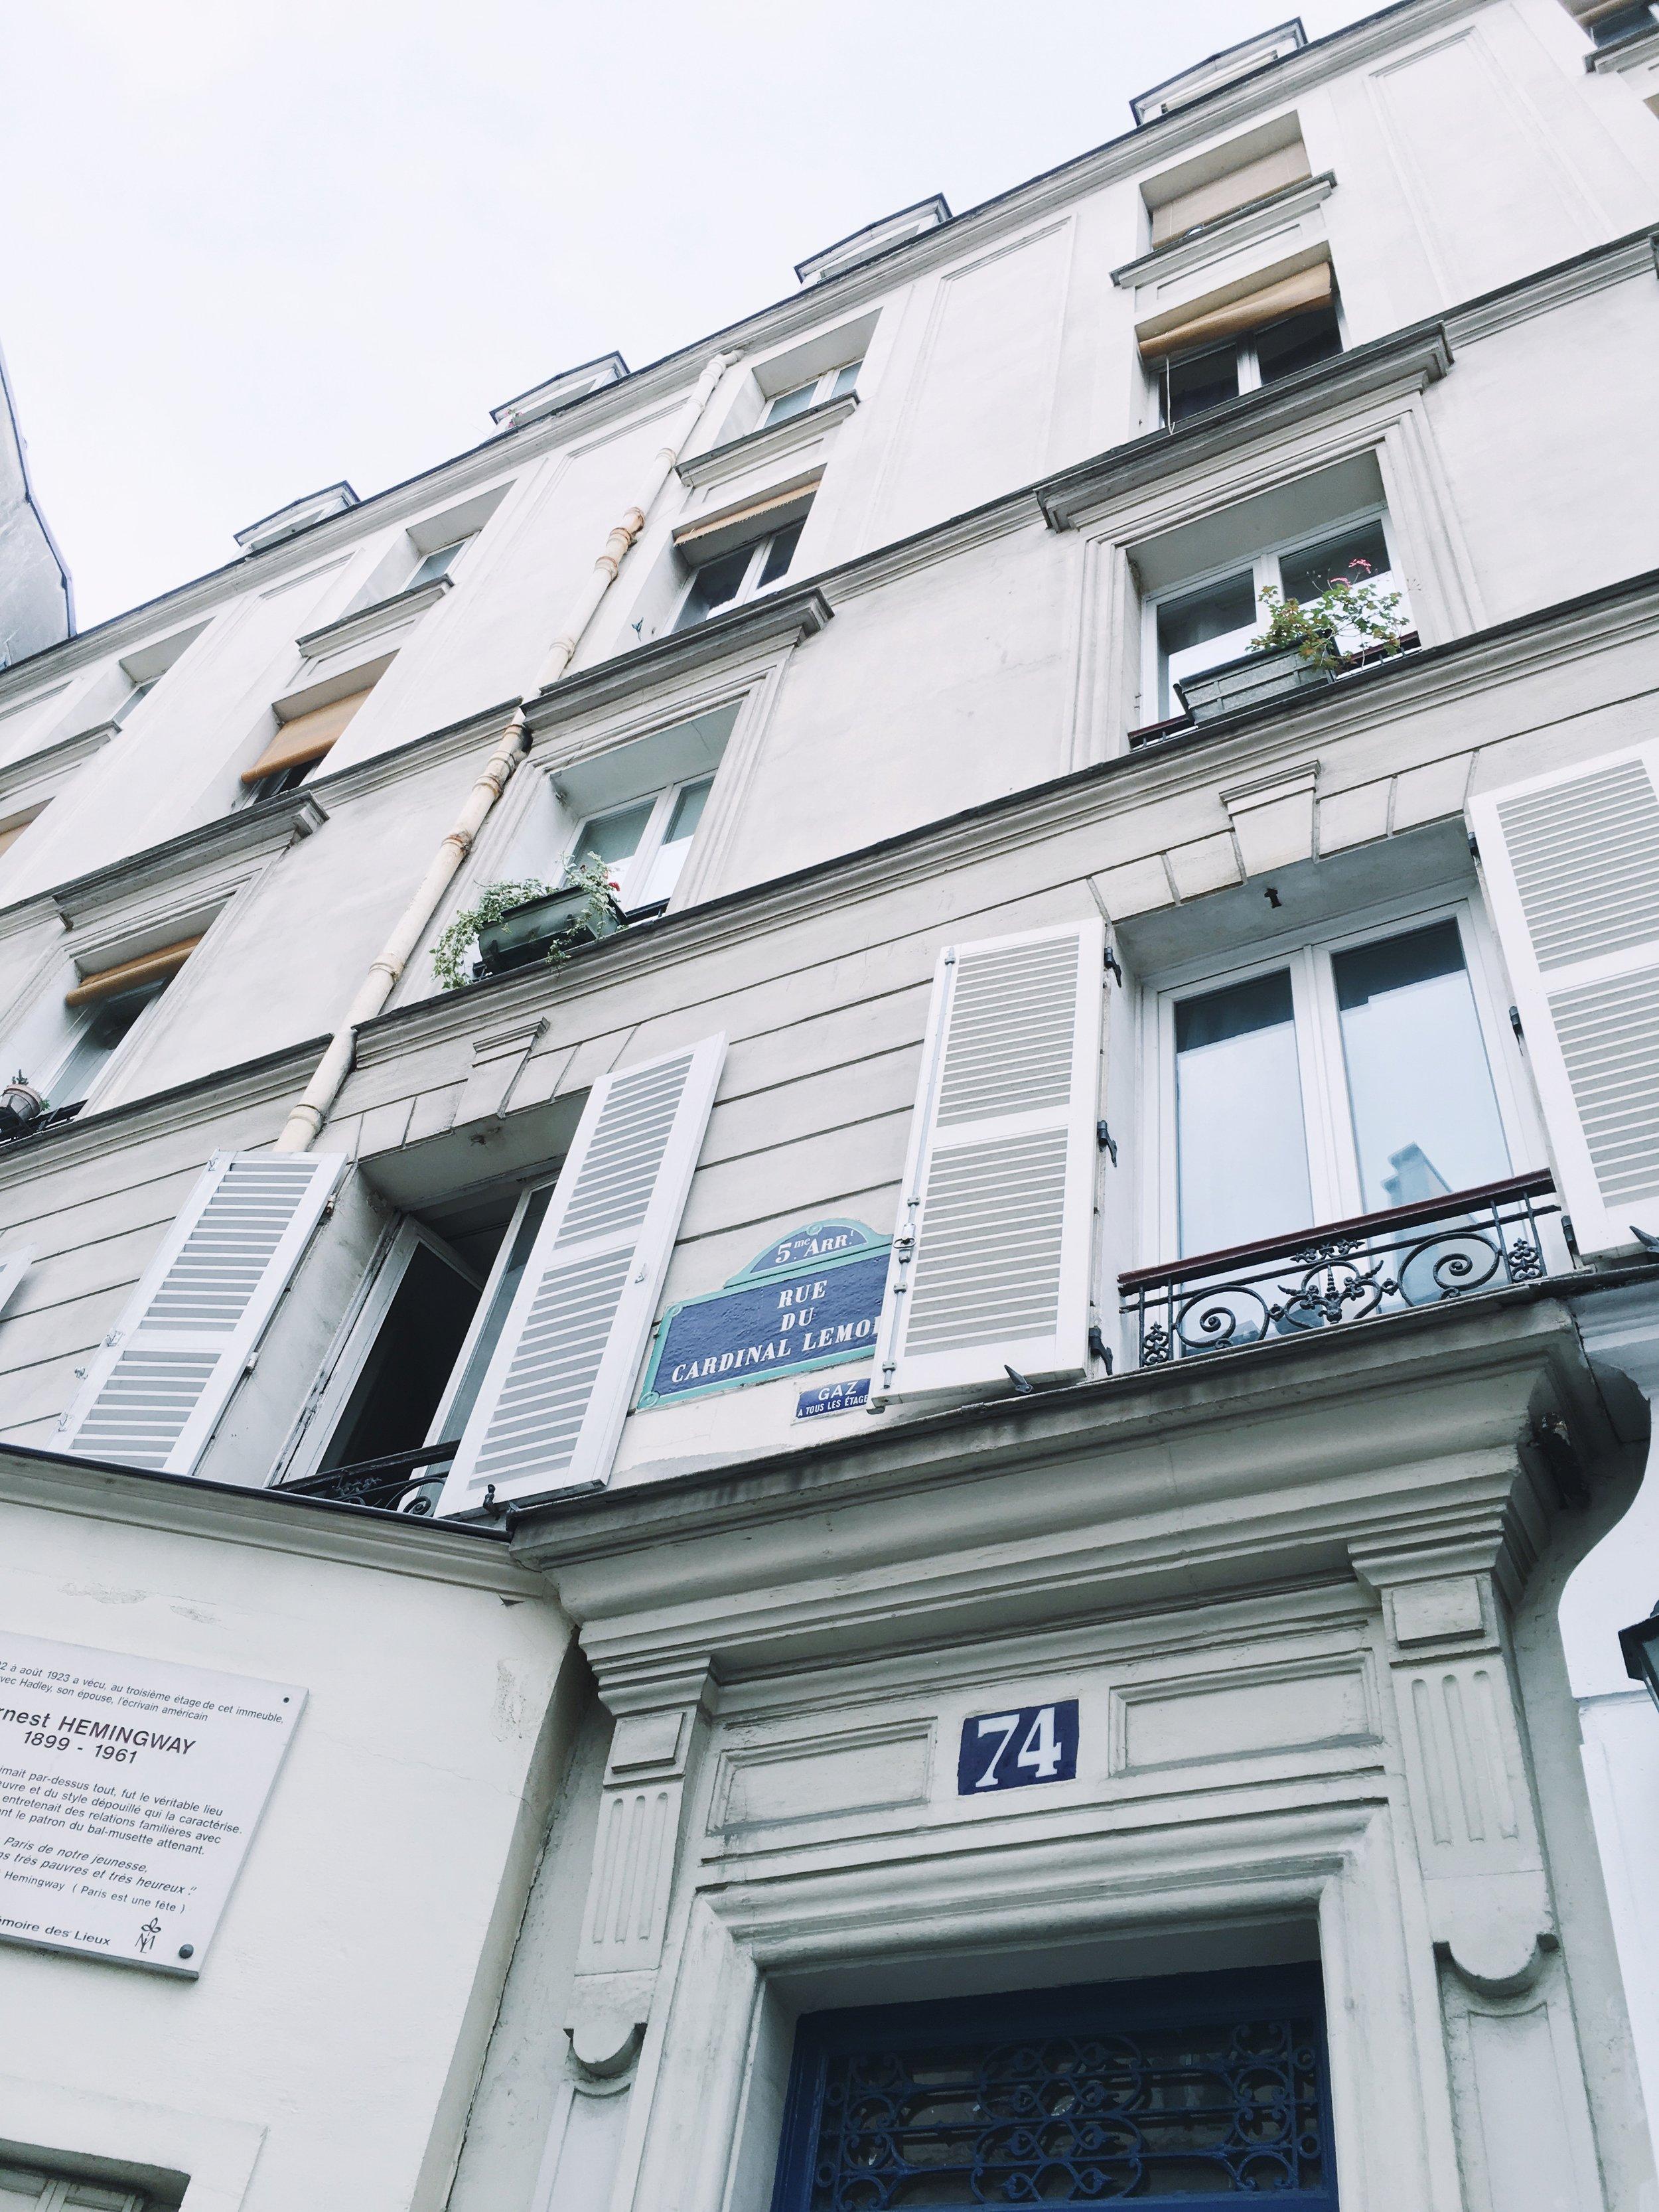 Ernest & Hadley's first Paris Apartment. OMG.